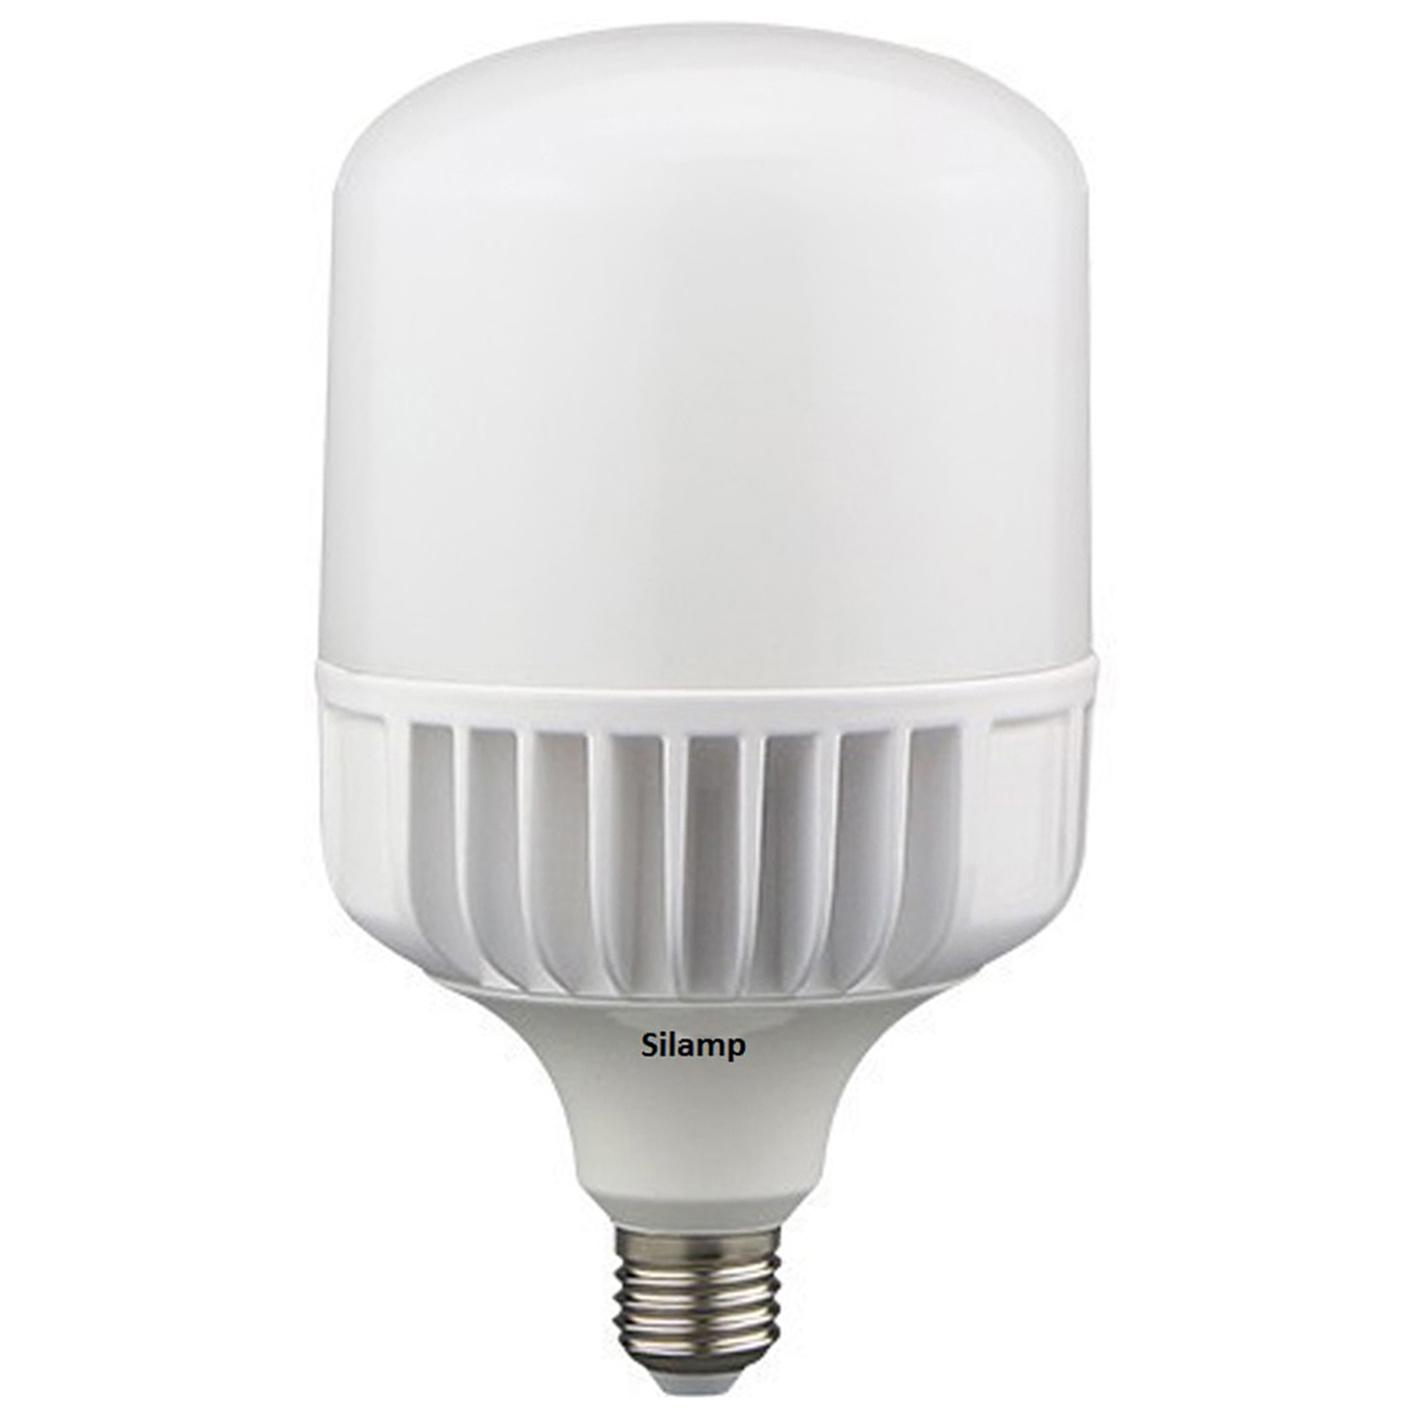 Lampadine G9 Led 100w.Led Bulb E27 200w Big Globe Led